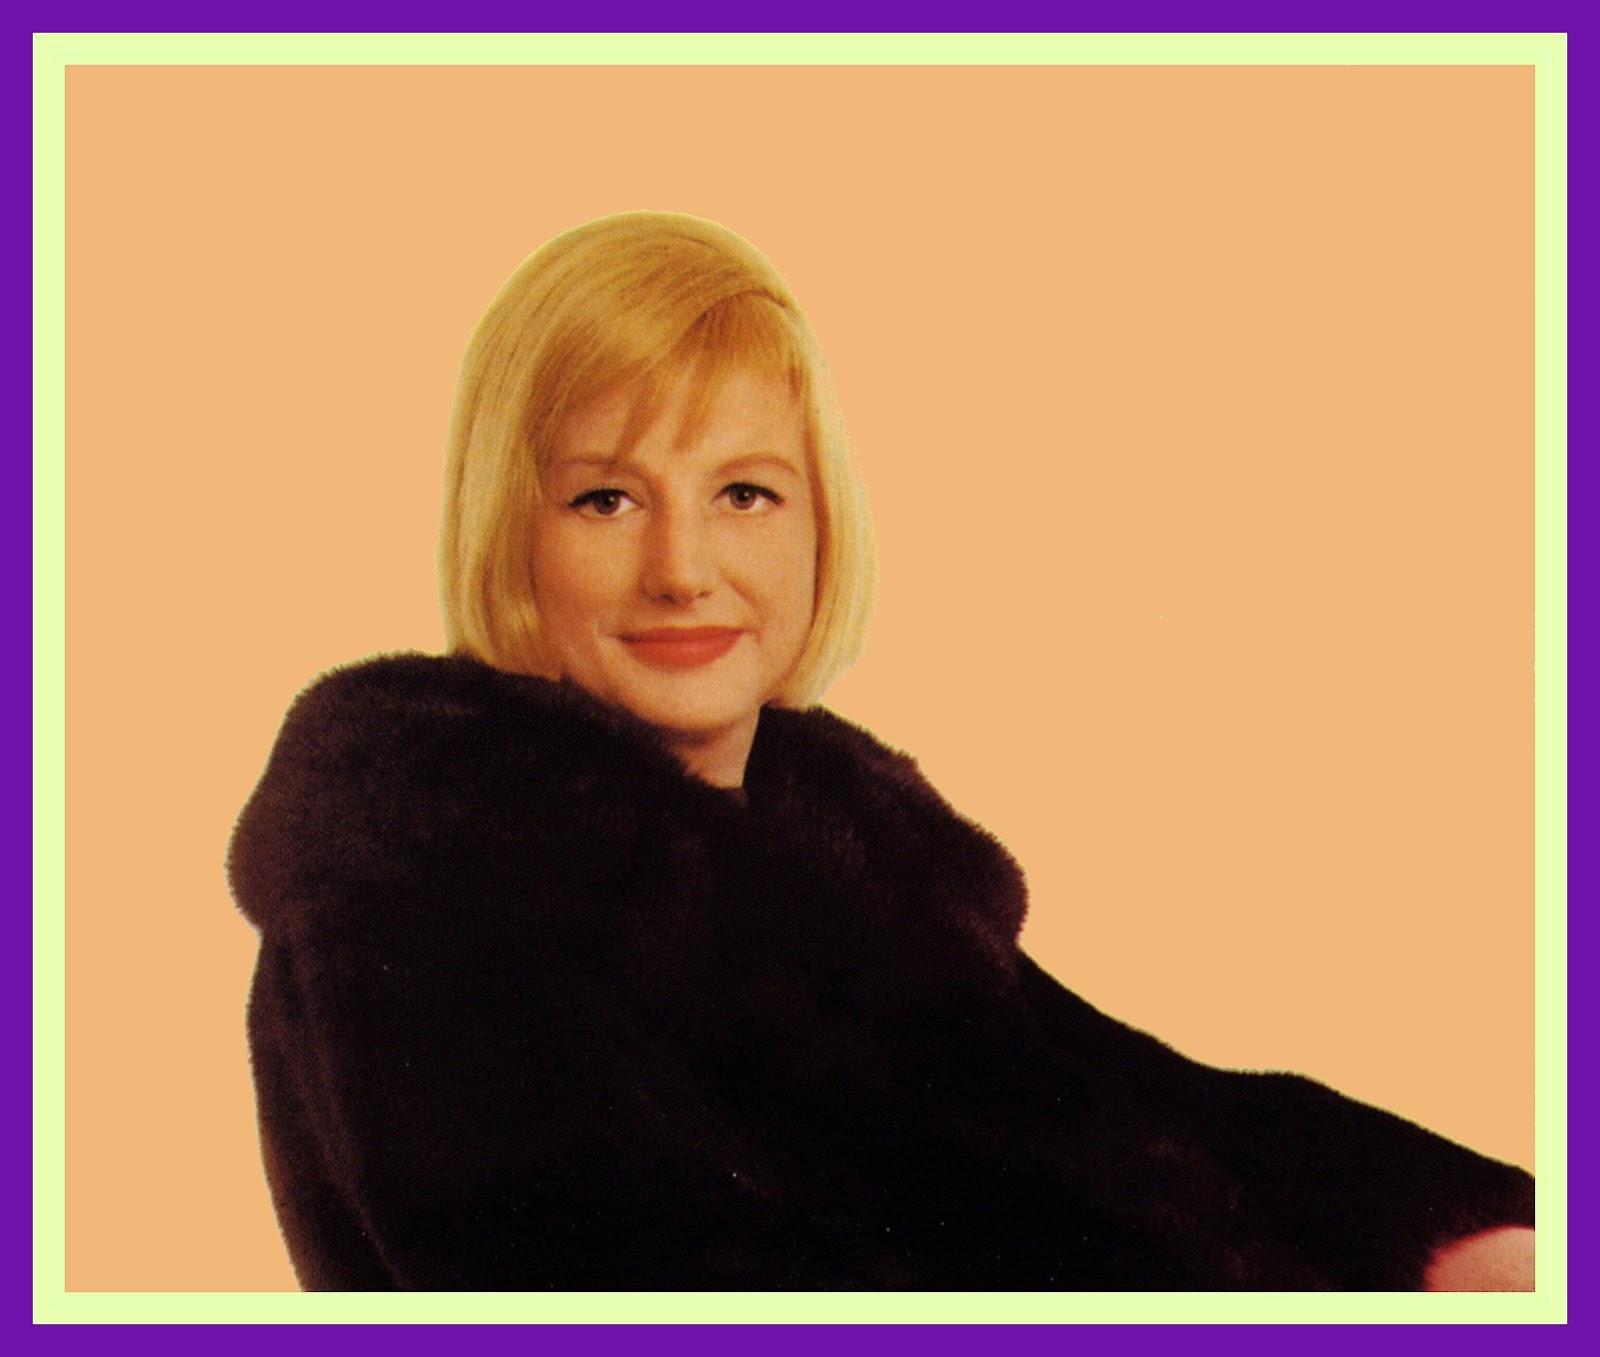 Jenny Hammond sings Blossom Dearie @Seven Arts 11 Nov 1.30pm